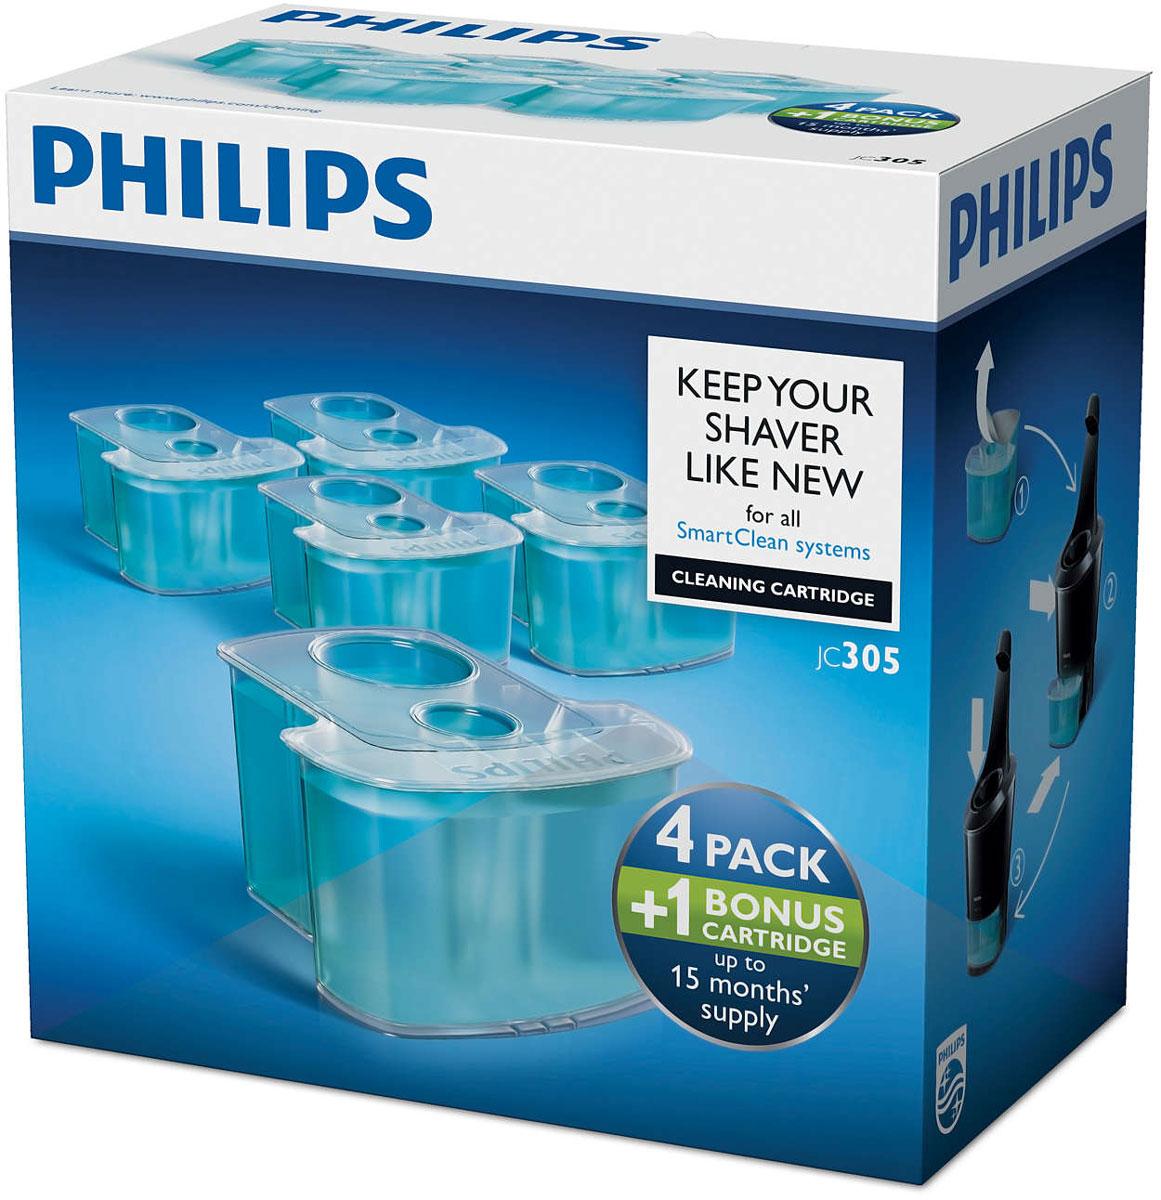 Philips JC305/50картридж для очистки электробритвы Philips